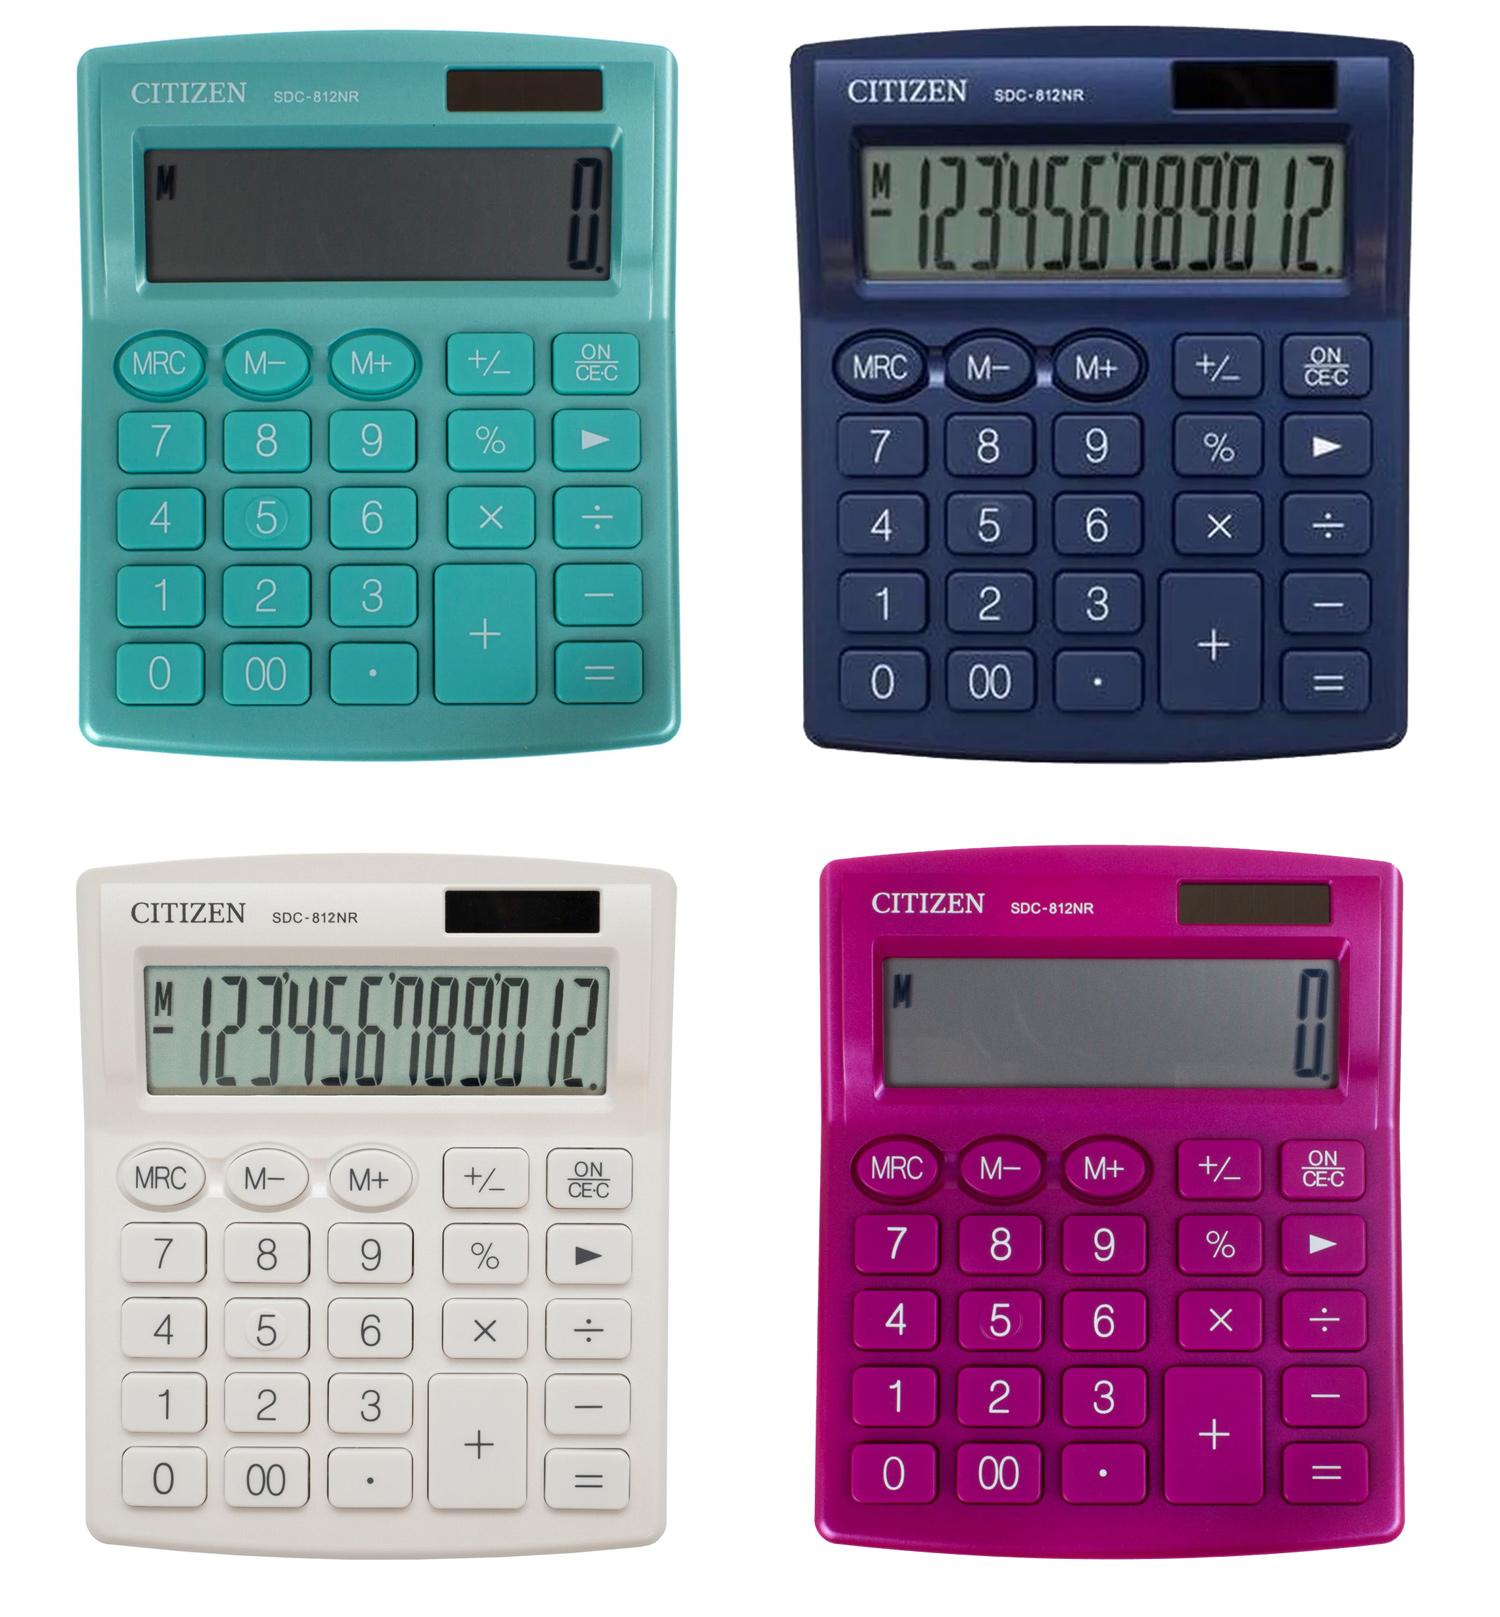 Калькулятор бухгалтерский SDC812NRWHE-white 12 разрядов, 125х100х34мм., бел. Citizen - фото 5